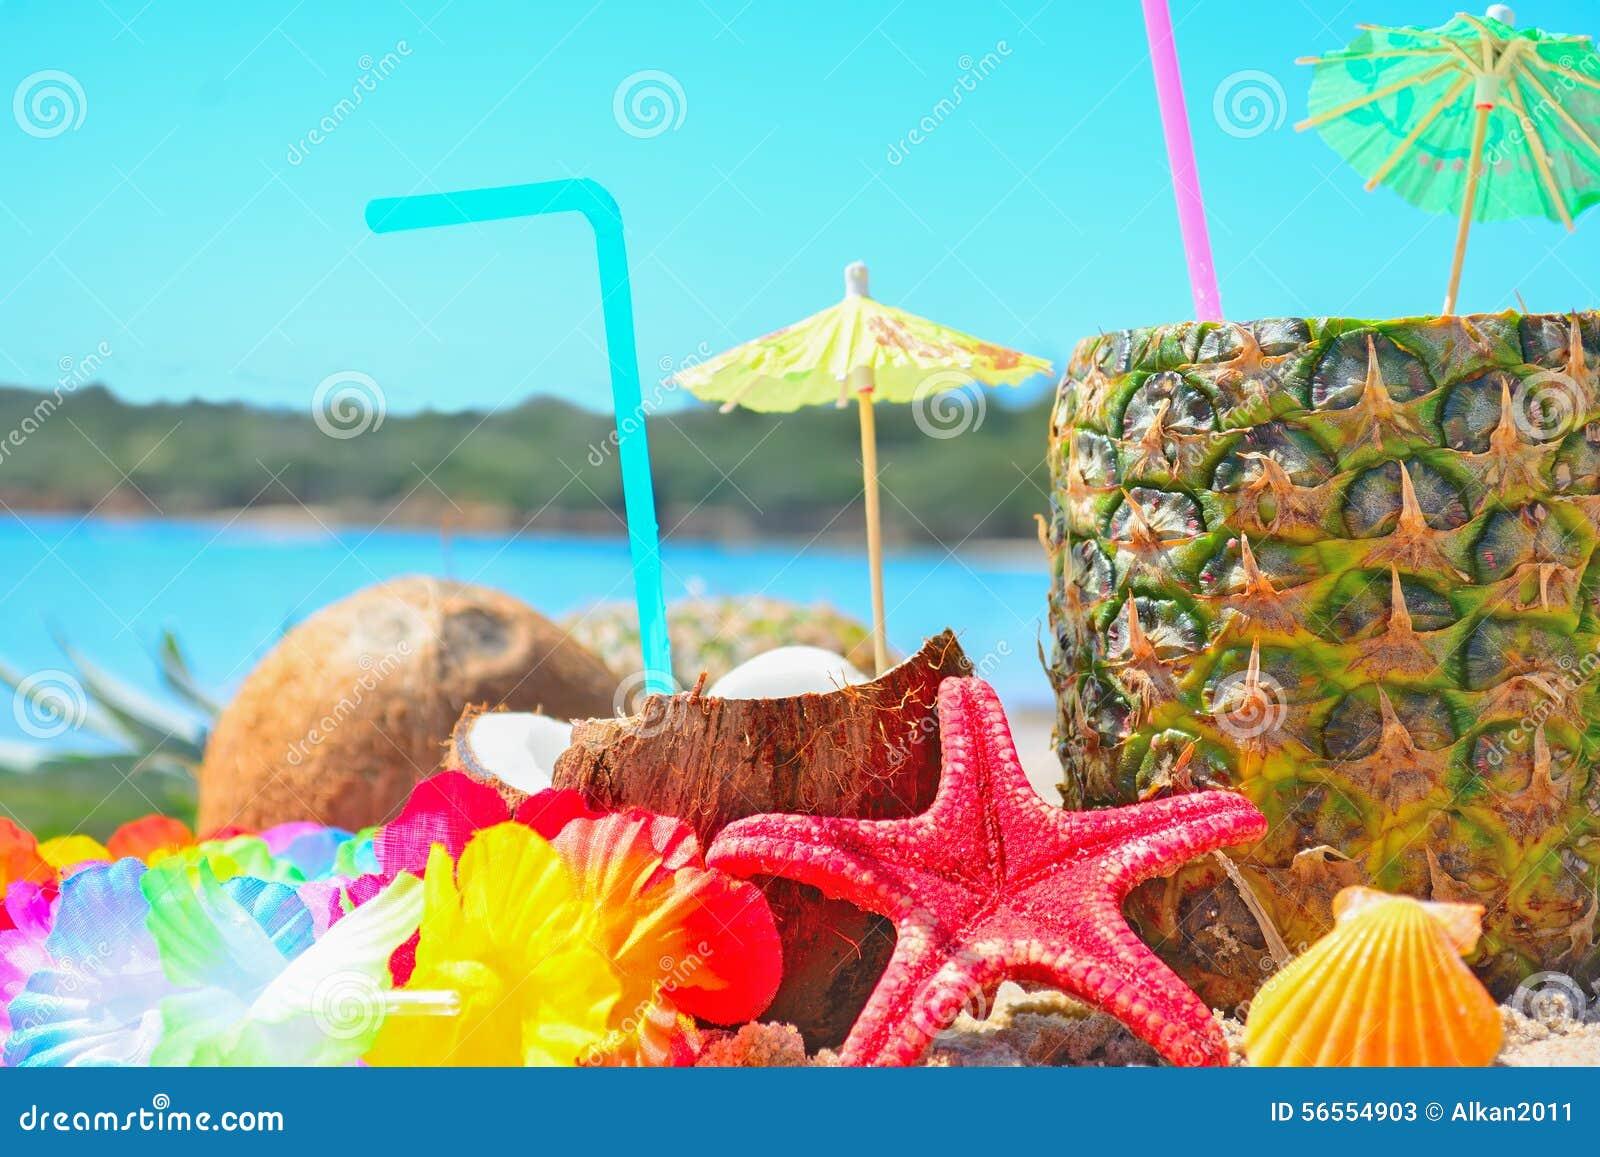 Download Φρέσκα τροπικά φρούτα θαλασσίως Στοκ Εικόνα - εικόνα από hawaiian, καρπός: 56554903